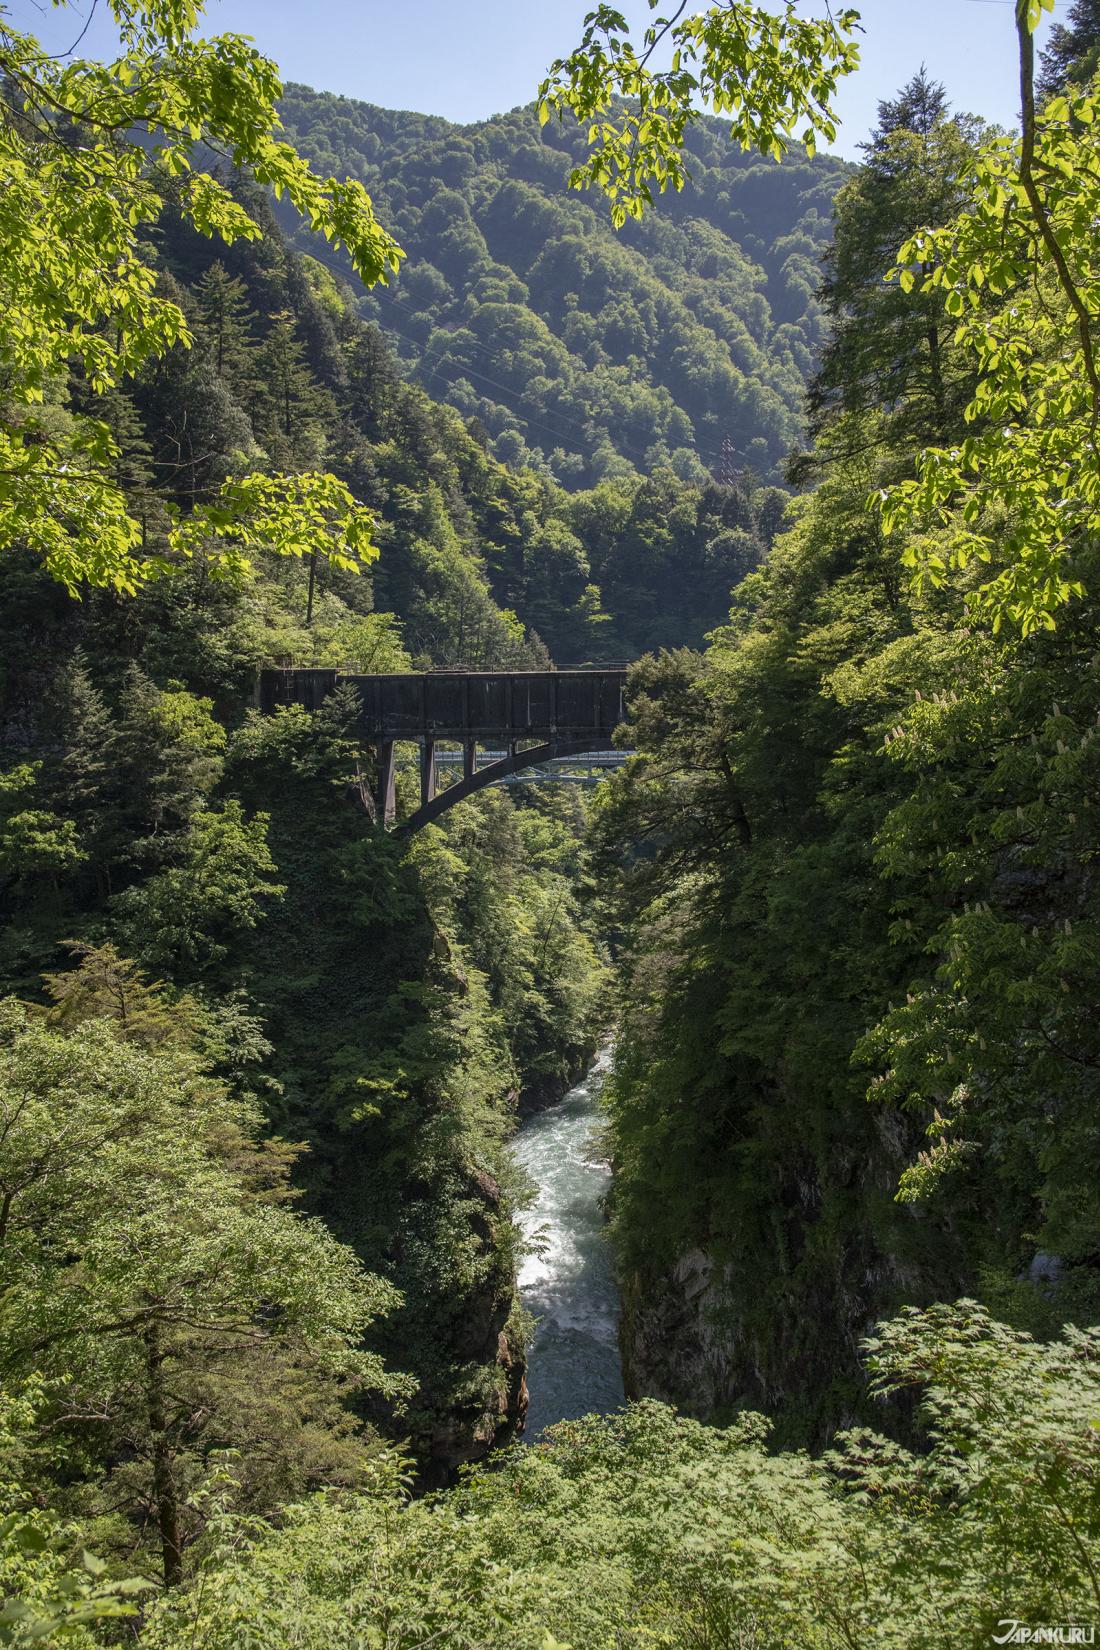 Atobiki Bridge (後曳橋), seen over the seemingly bottomless valley.